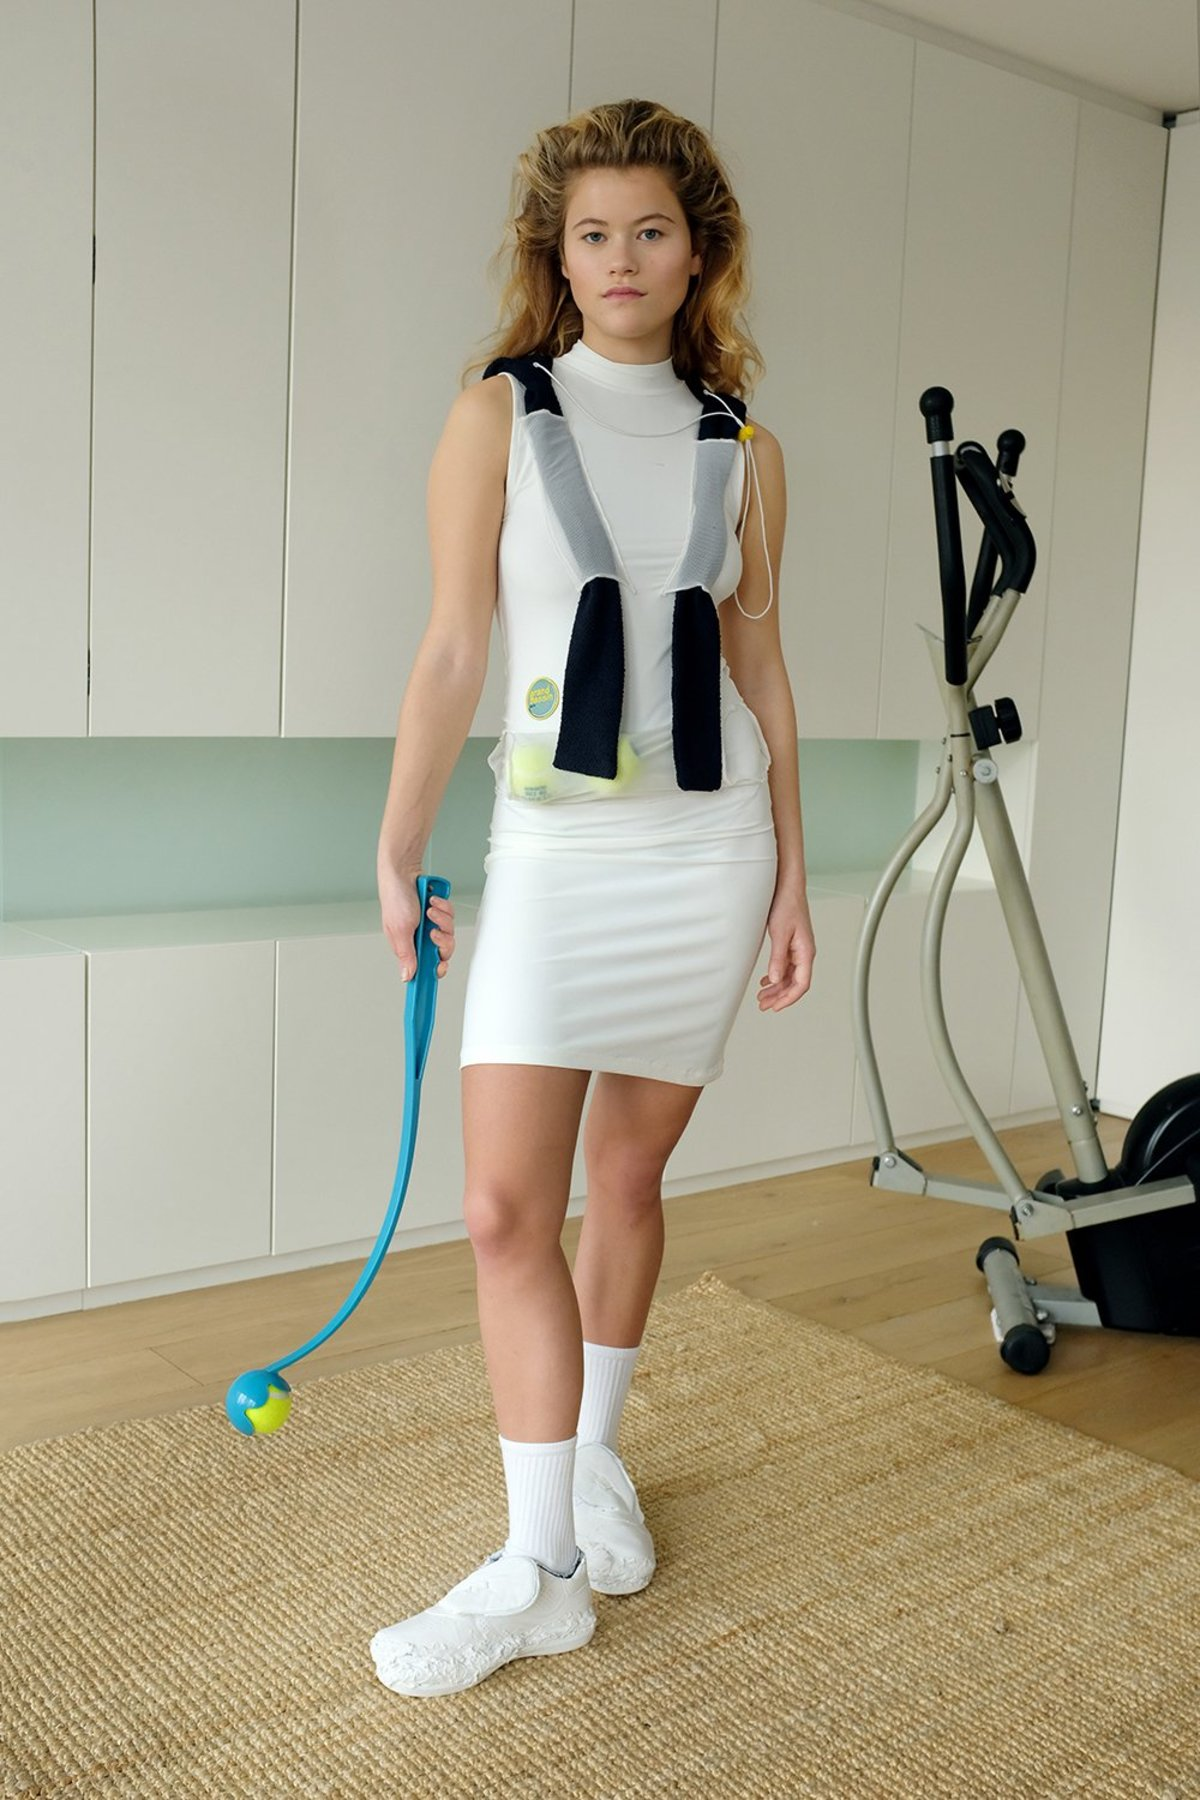 Sample Cm Gb150 Tennis Dress And Hood Kit Garmentory